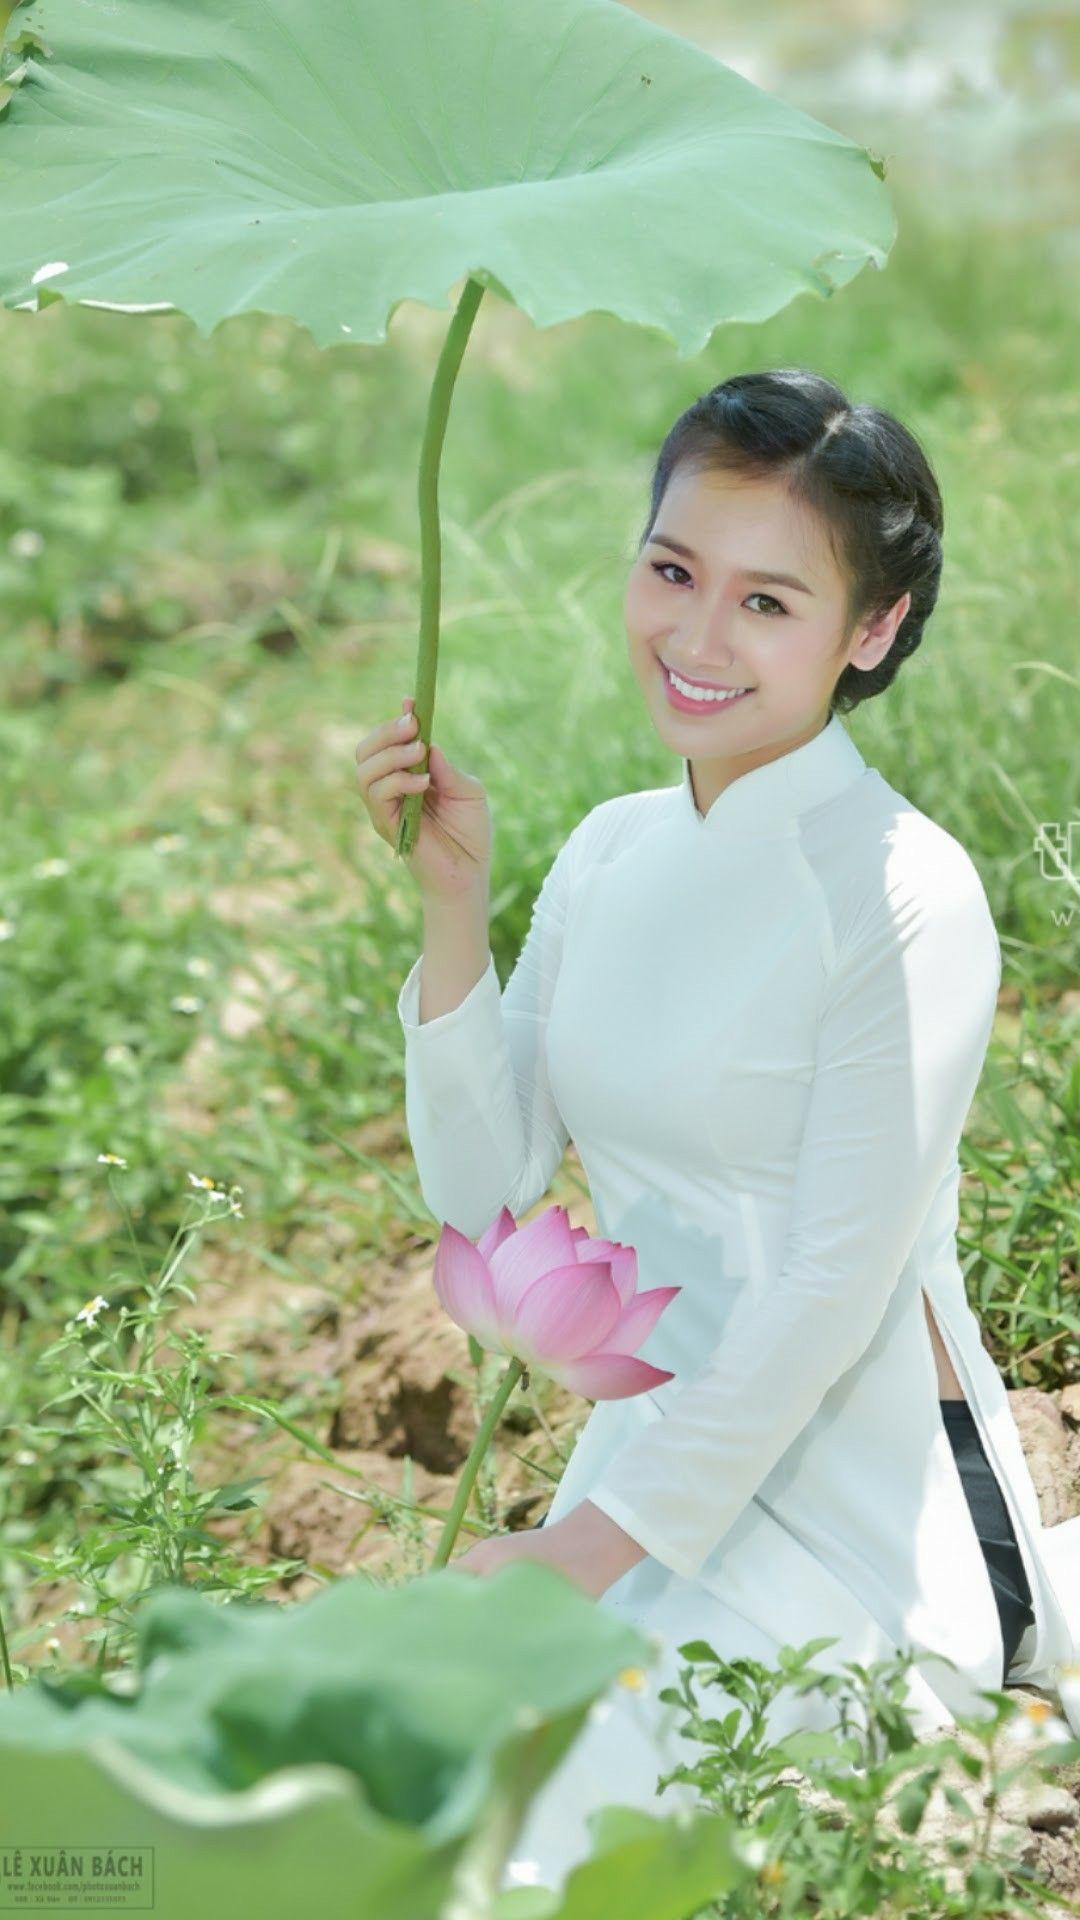 Pin by hoàng anh on chân dung pinterest ao dai and girls